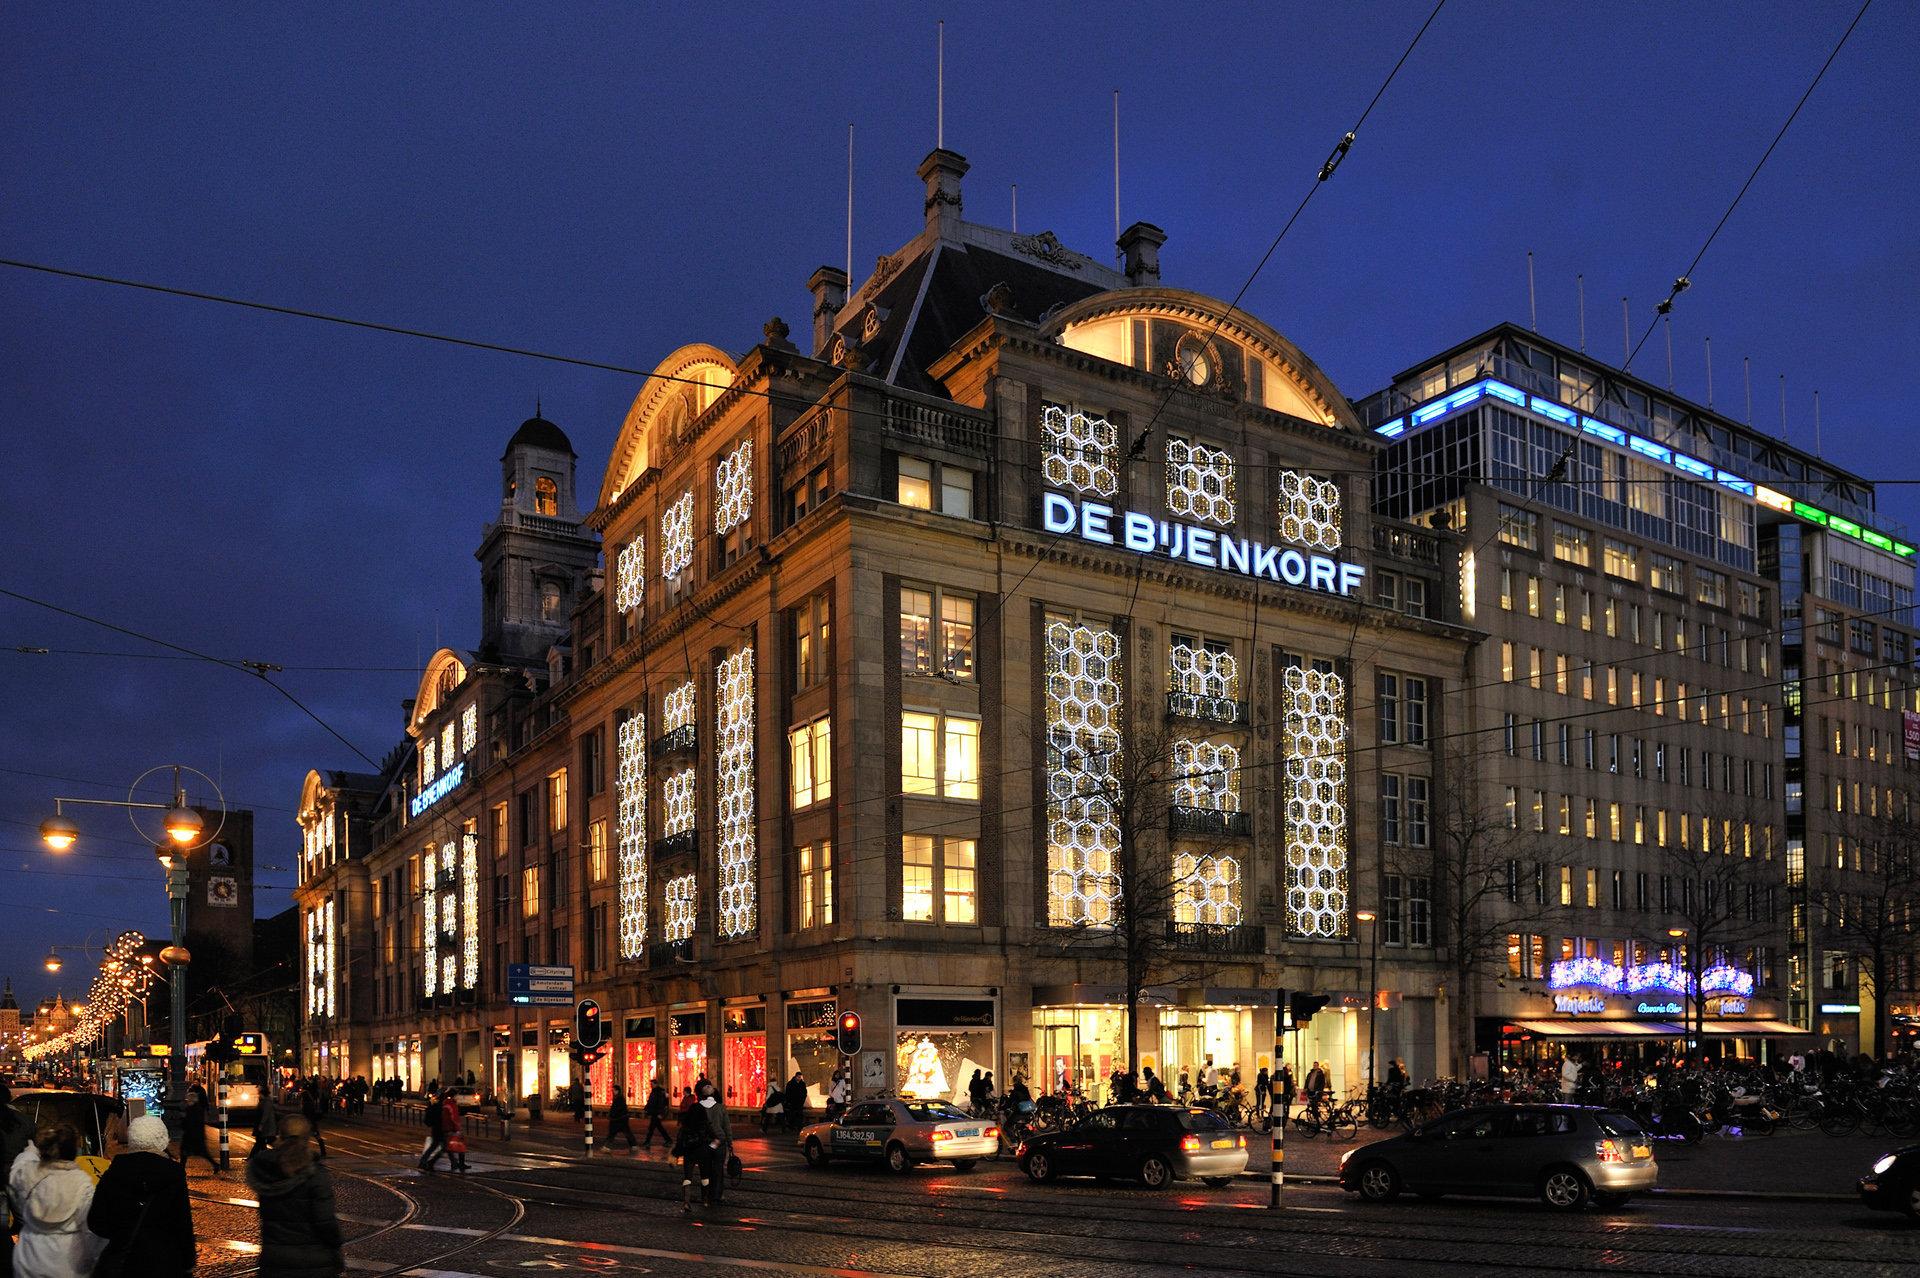 'De Bijenkorf' main store, Amsterdam (NL)